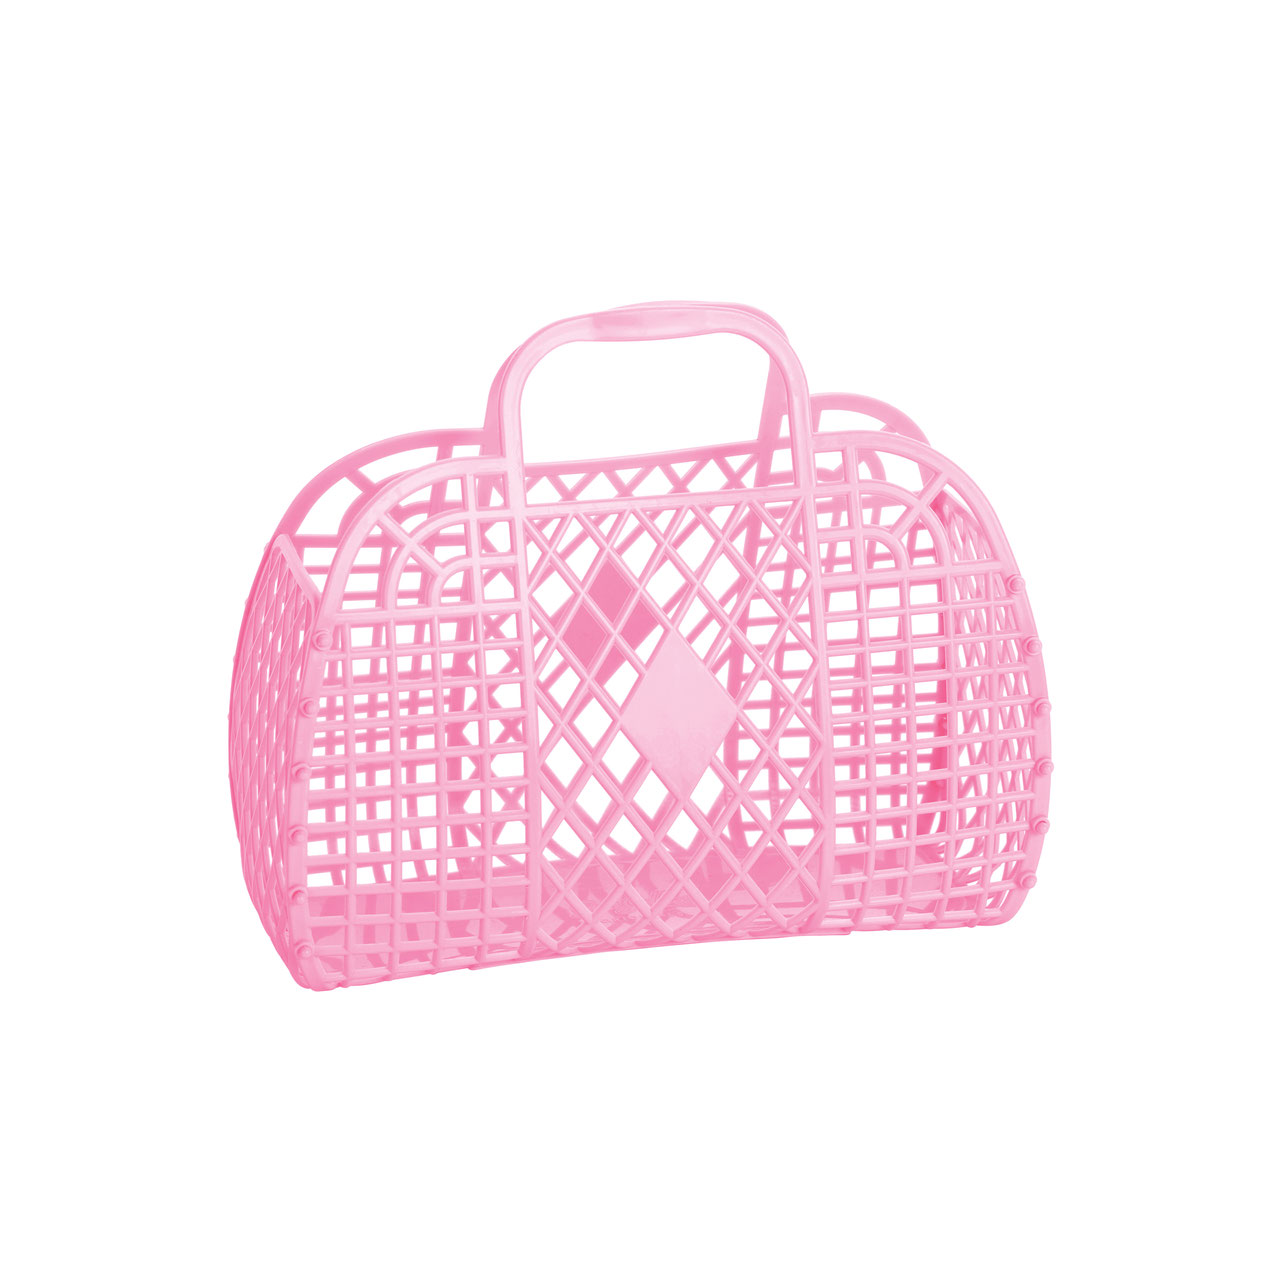 Sun Jellies Retro Kurvetaske, bubblegum pink, lille